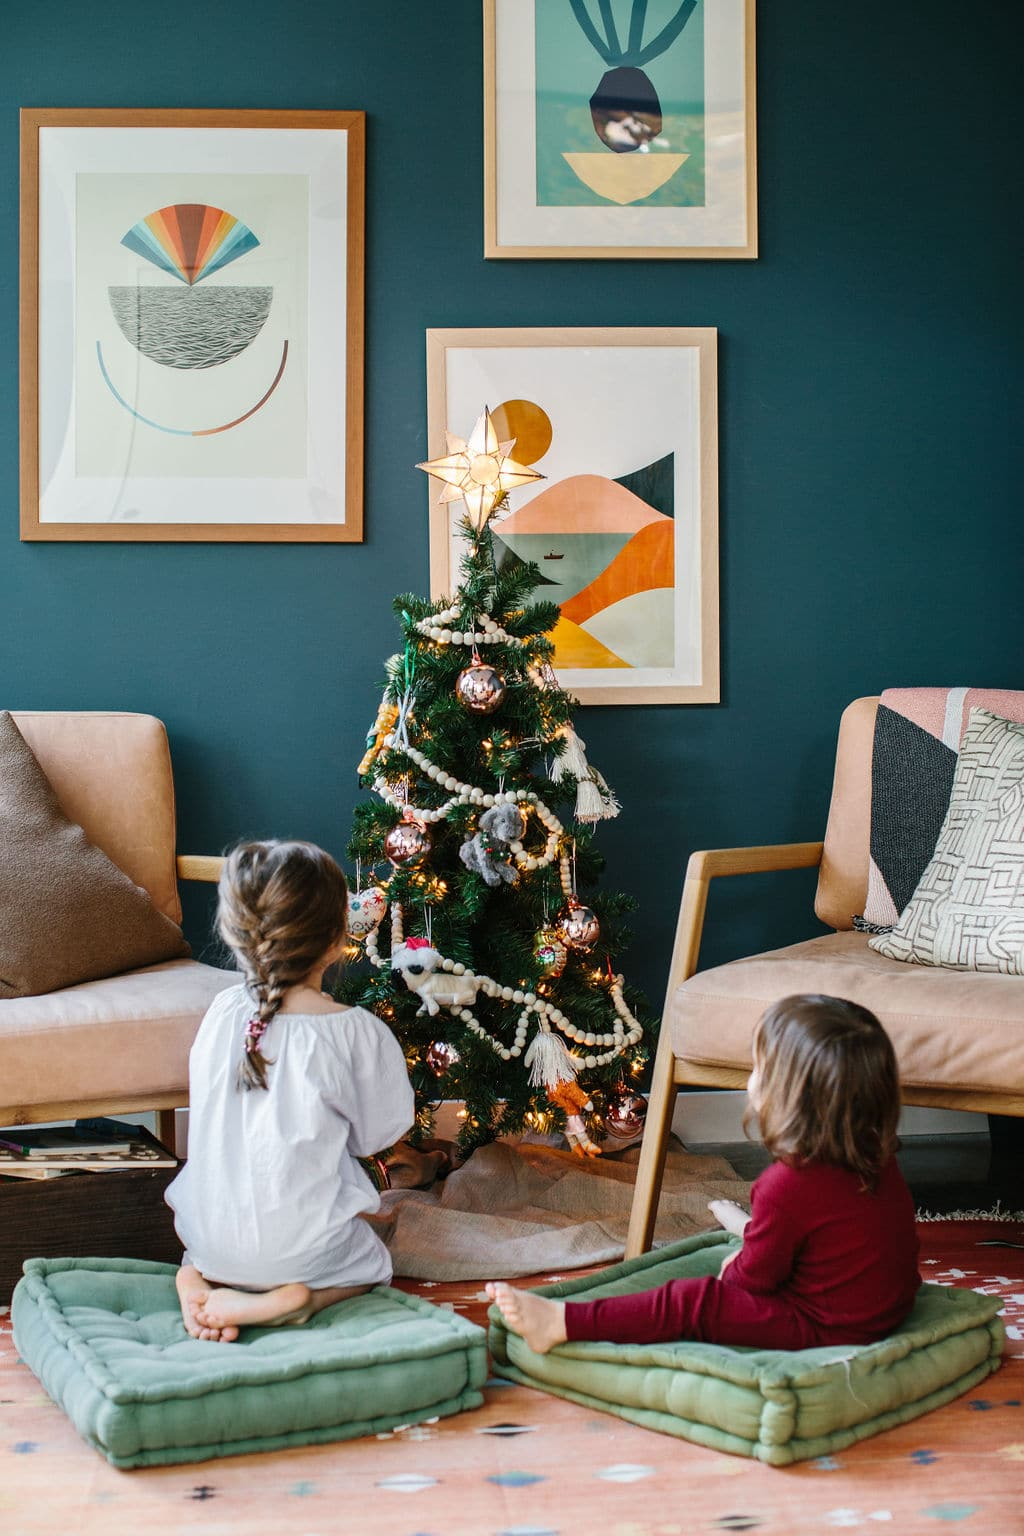 Kid's Christmas Tree Lights and Ornaments